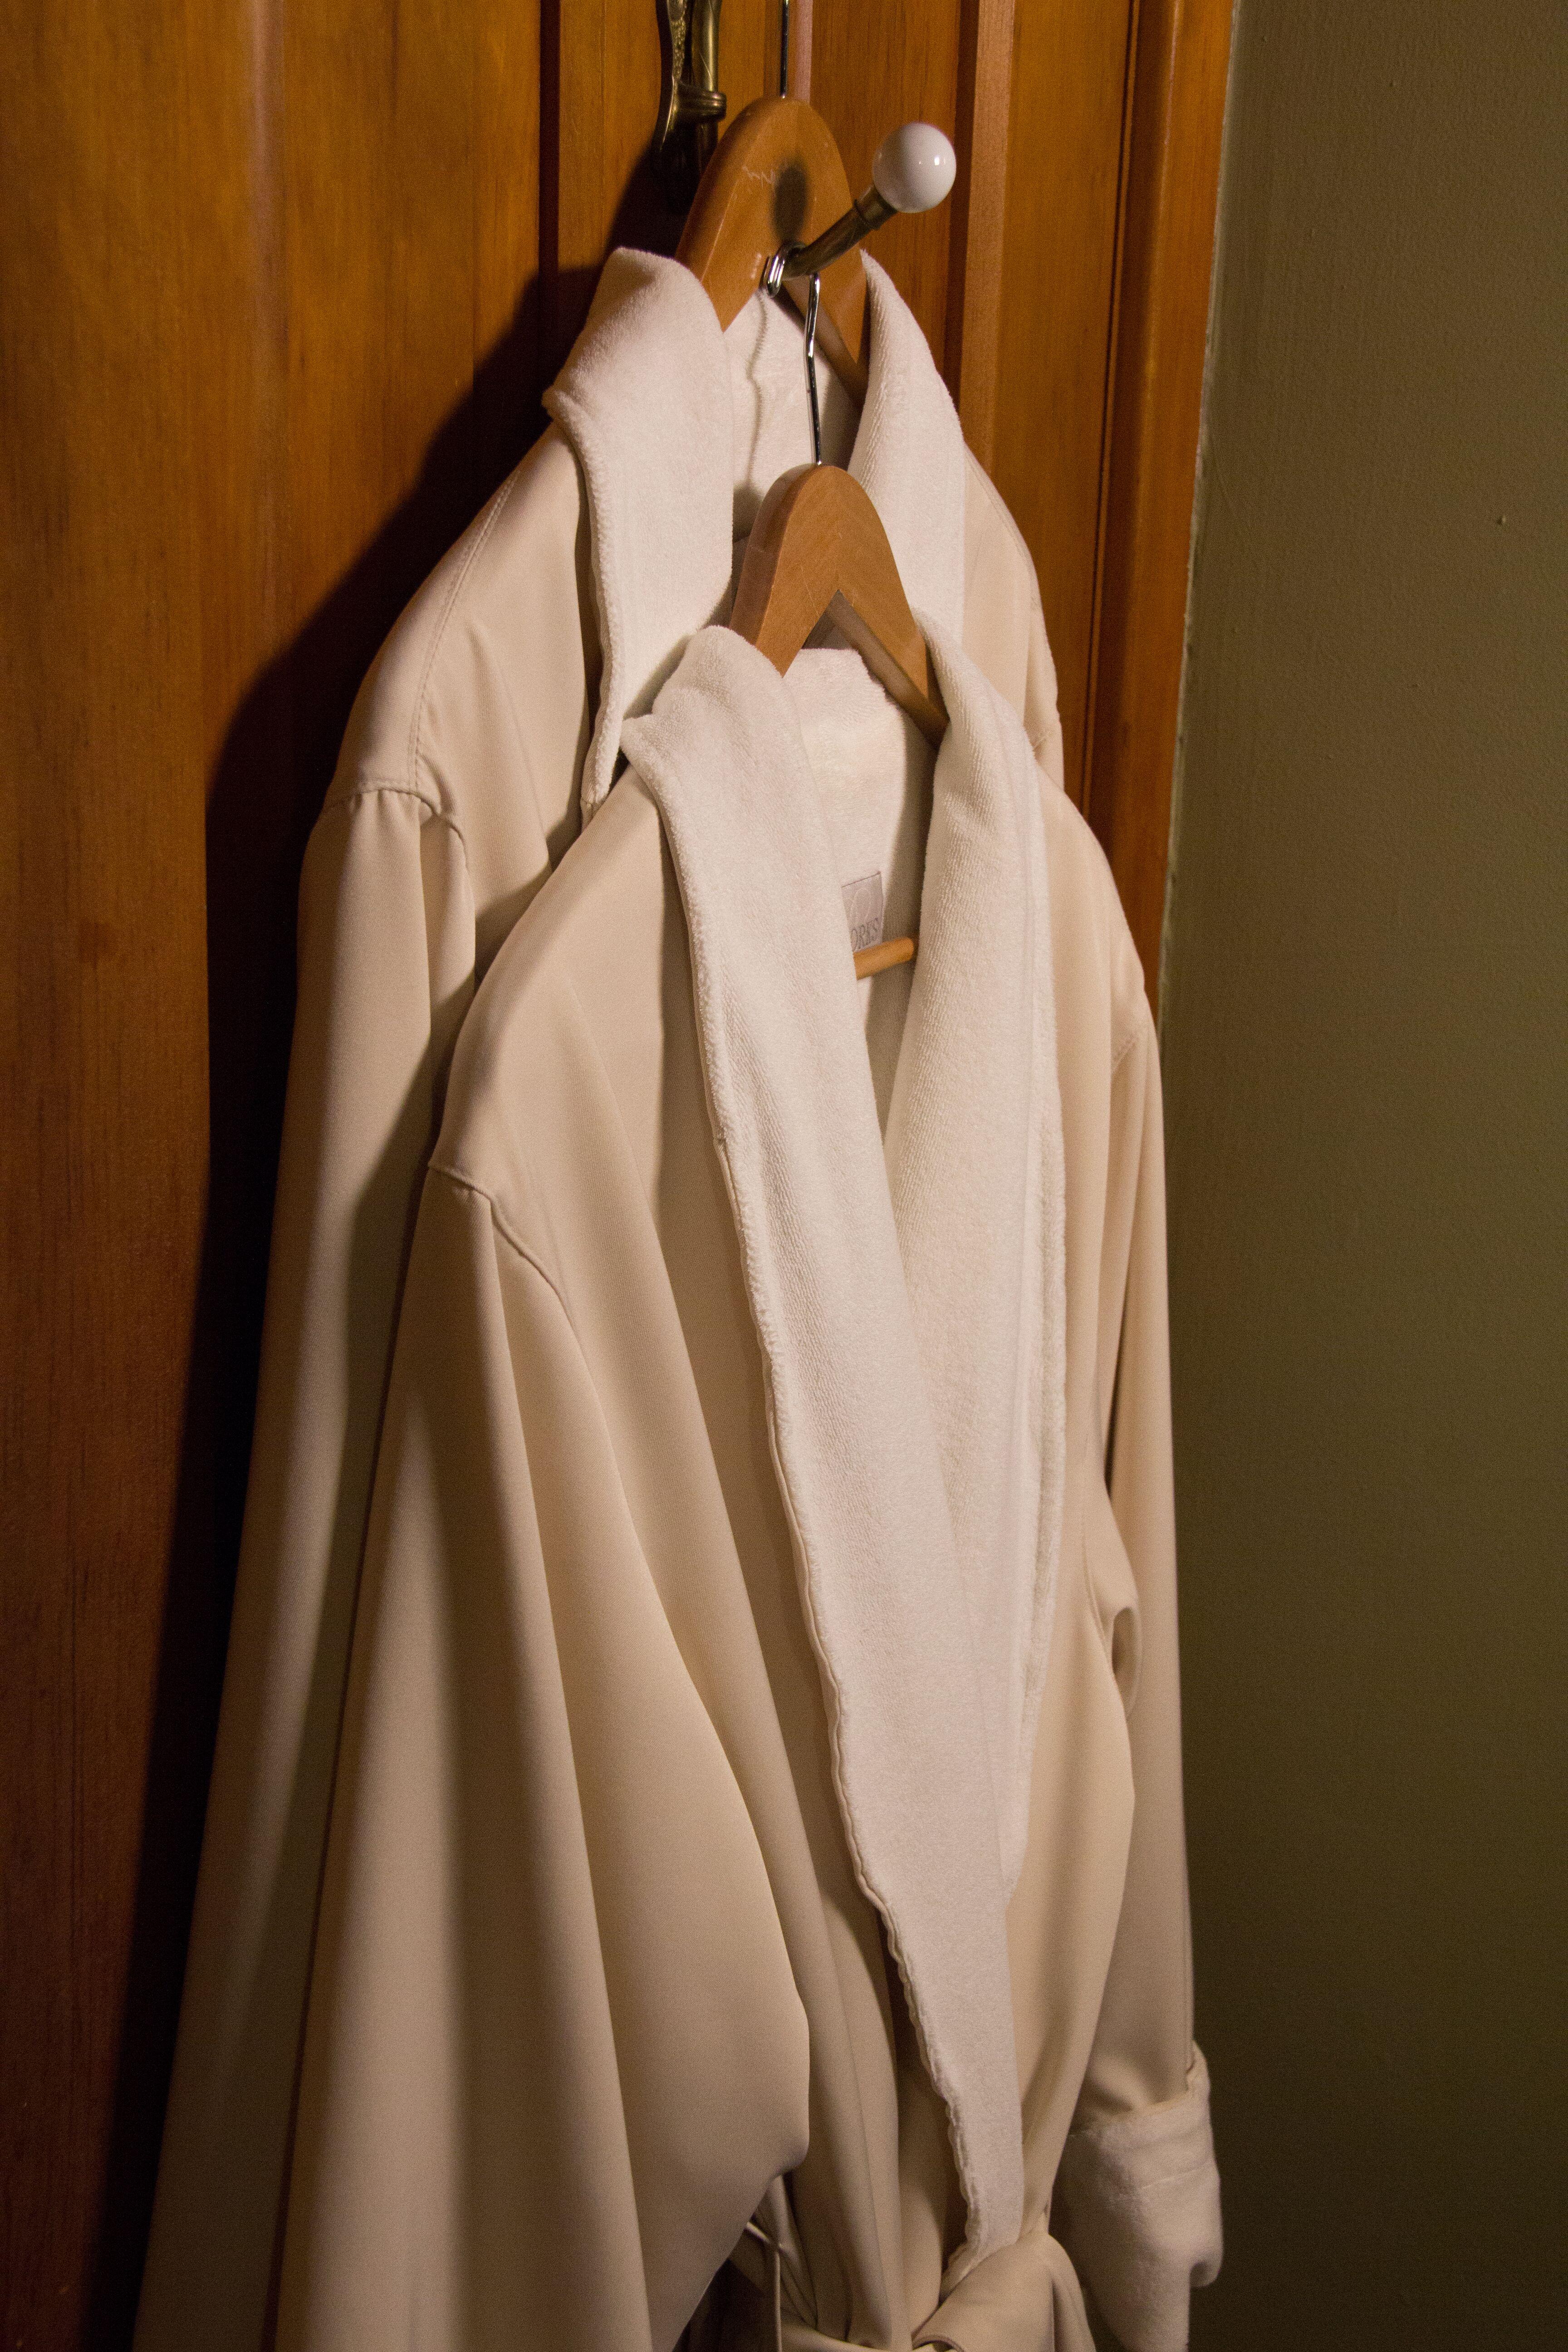 two cream colored robes handing from hook on wooden door